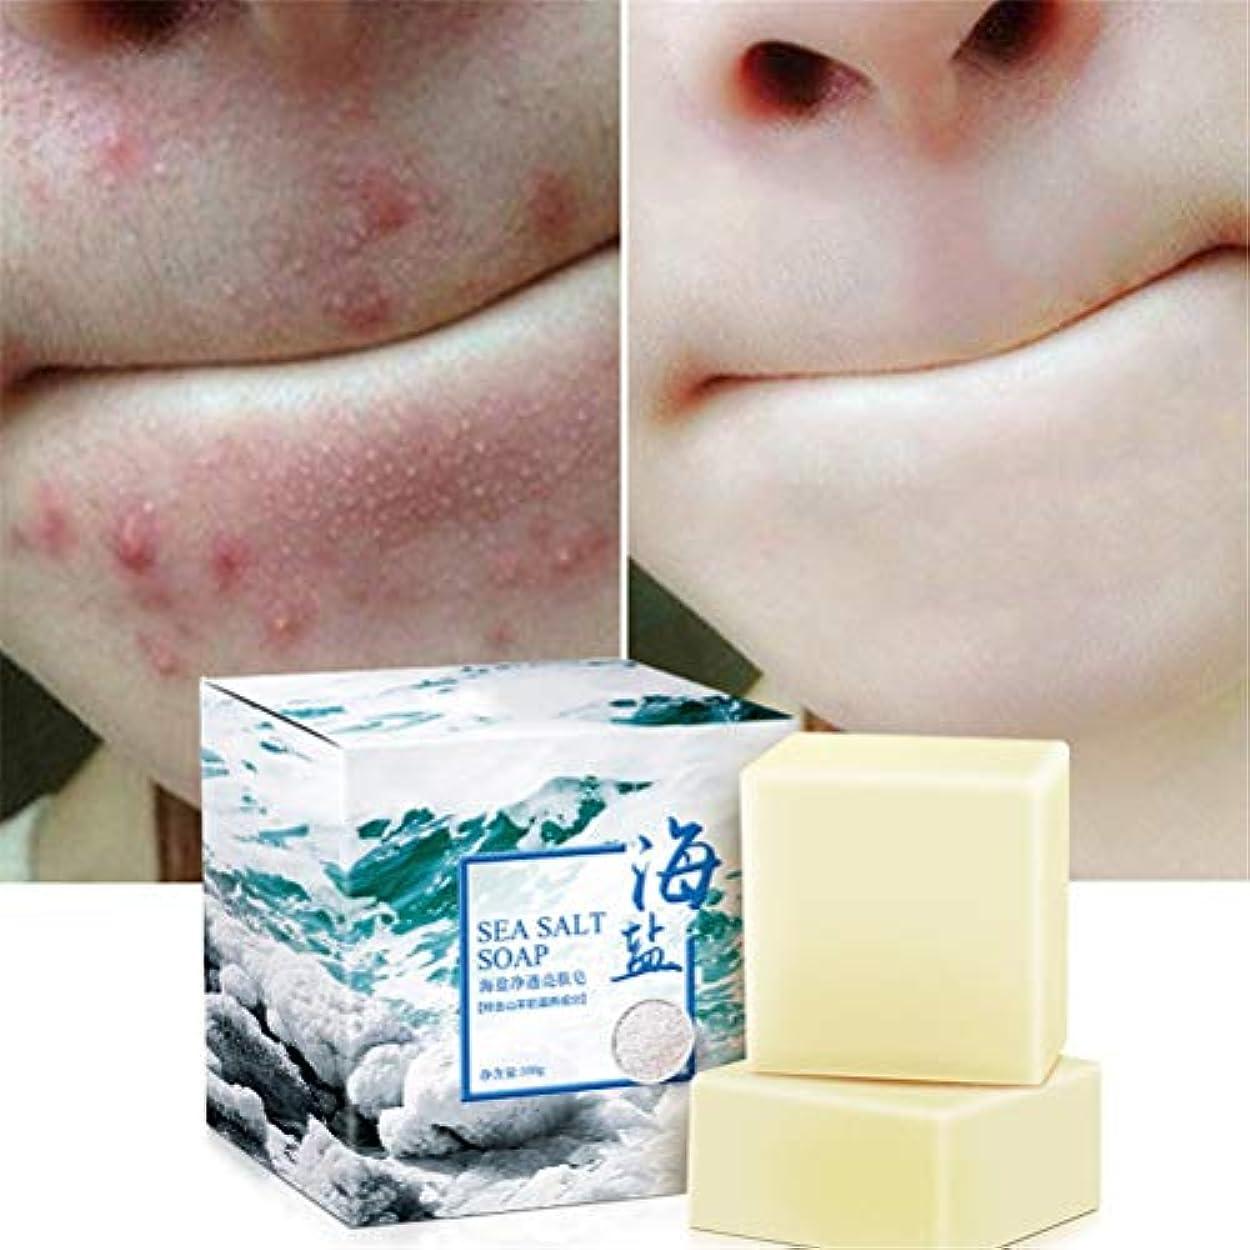 supbel 石鹸 洗顔石鹸 化粧石けん 浴用 全身 顔 ダニ除去 美肌 デリケートゾーン 低刺激 保湿 水分補給 毛穴 自然乾燥仕上げ アルコールフリー いい匂い シャワー用